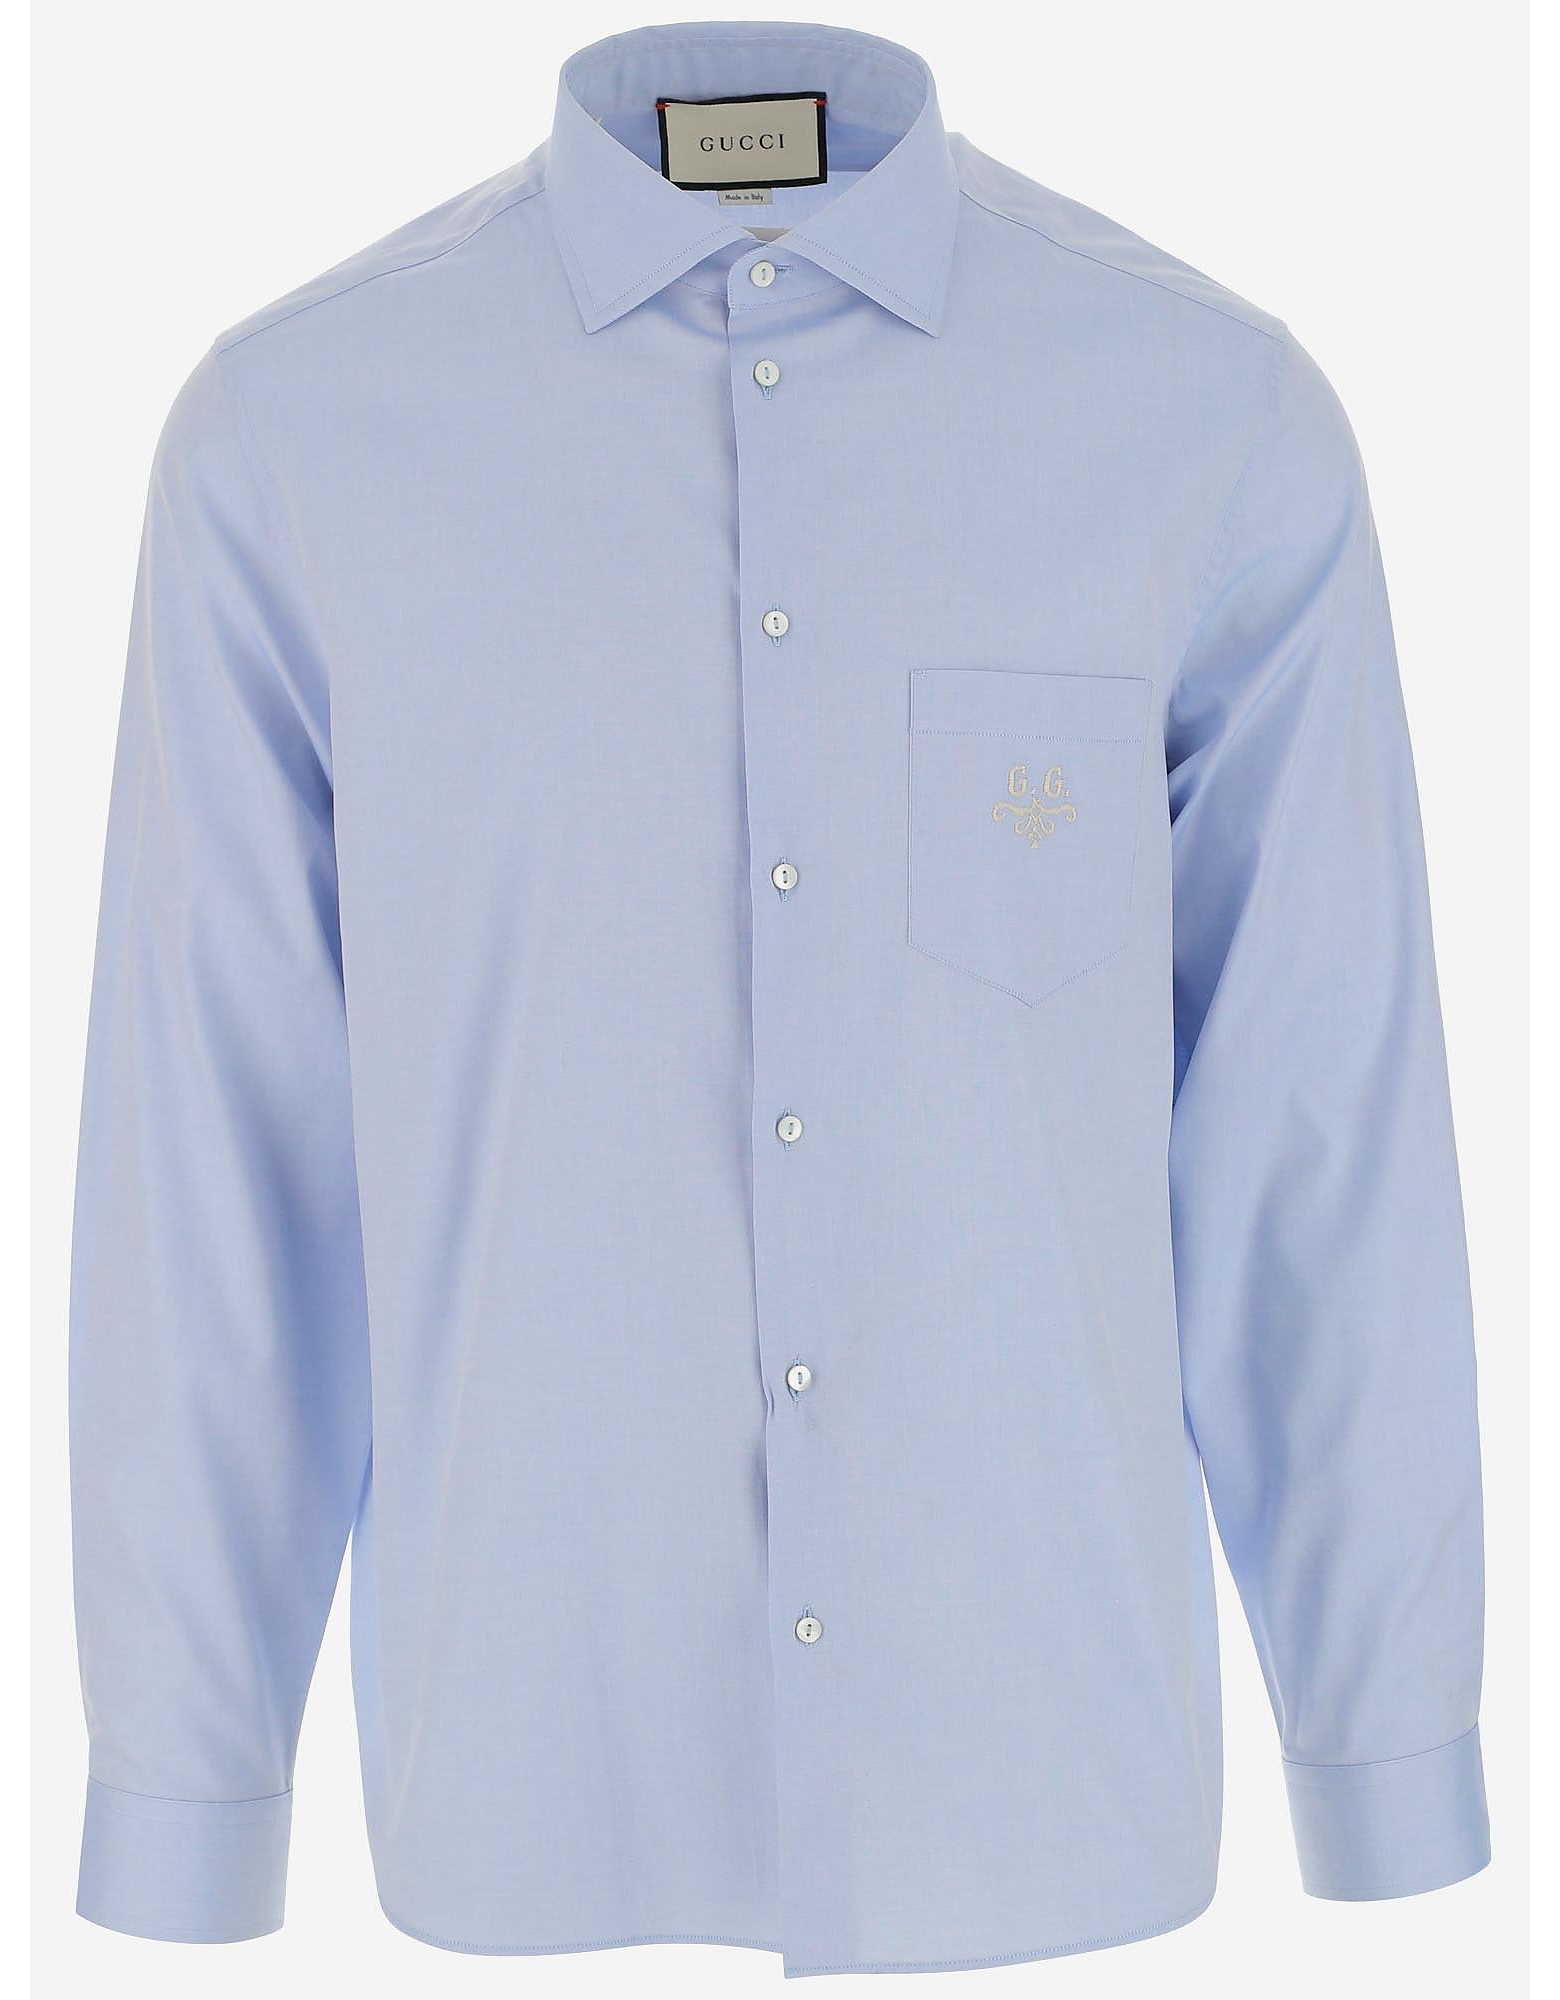 Gucci Designer Shirts, Men's Light Blue Cotton Shirt